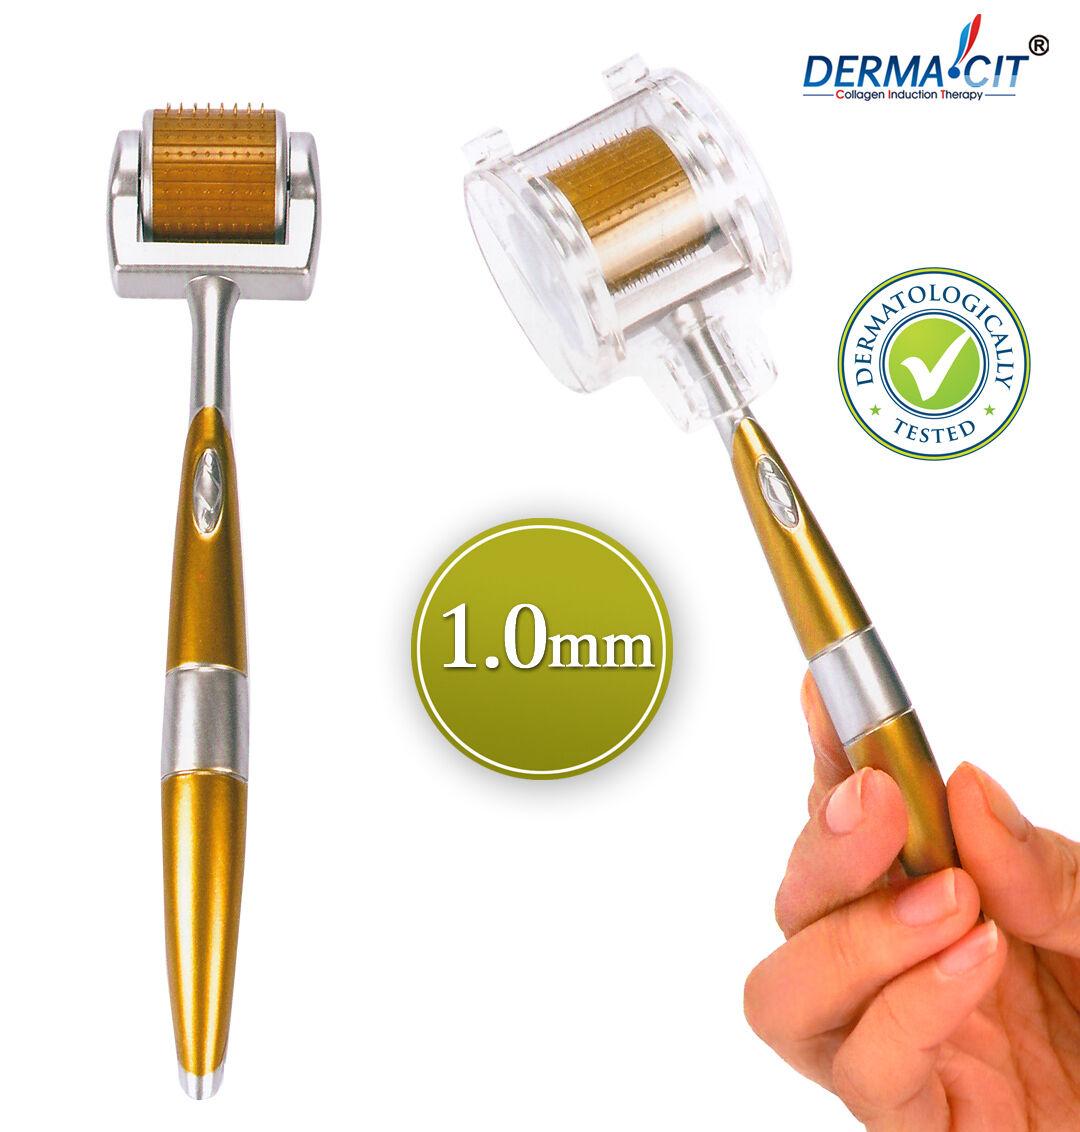 ZGTS® Titanium Premium Micro Derma Roller Wrinkles, Acne, S